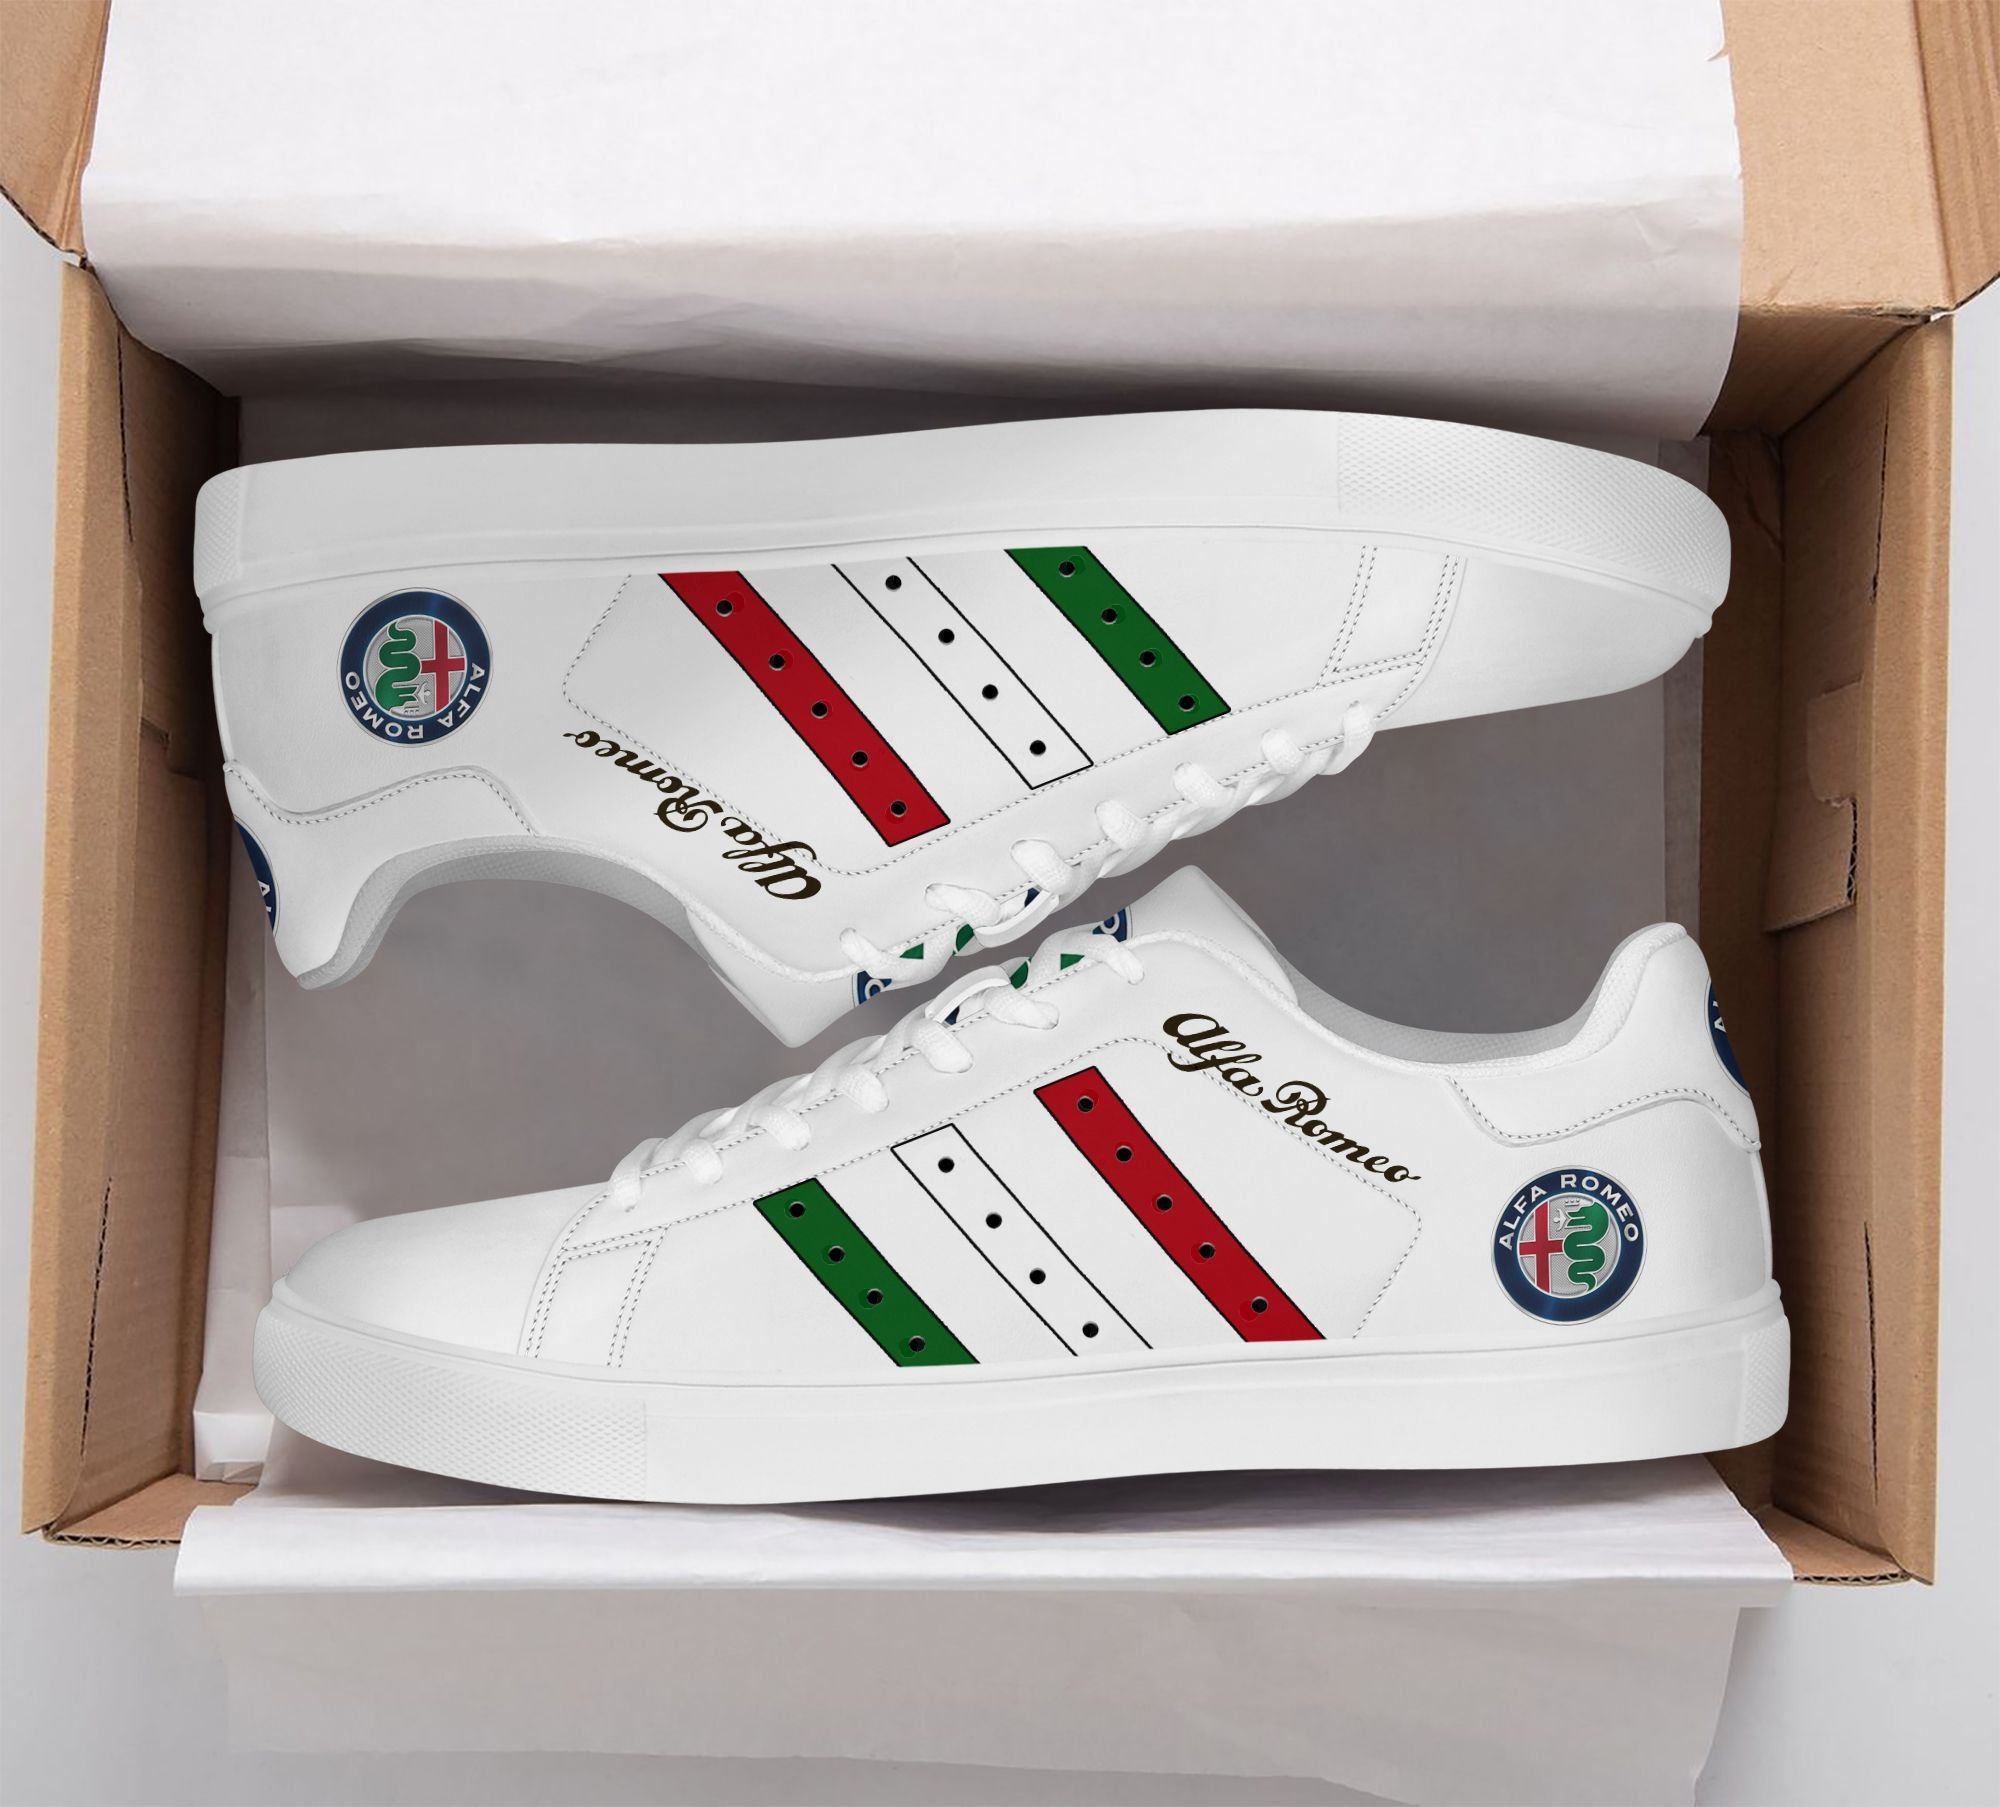 Alfa Romeo Color Stripe Lines in White Stan Smith Shoes